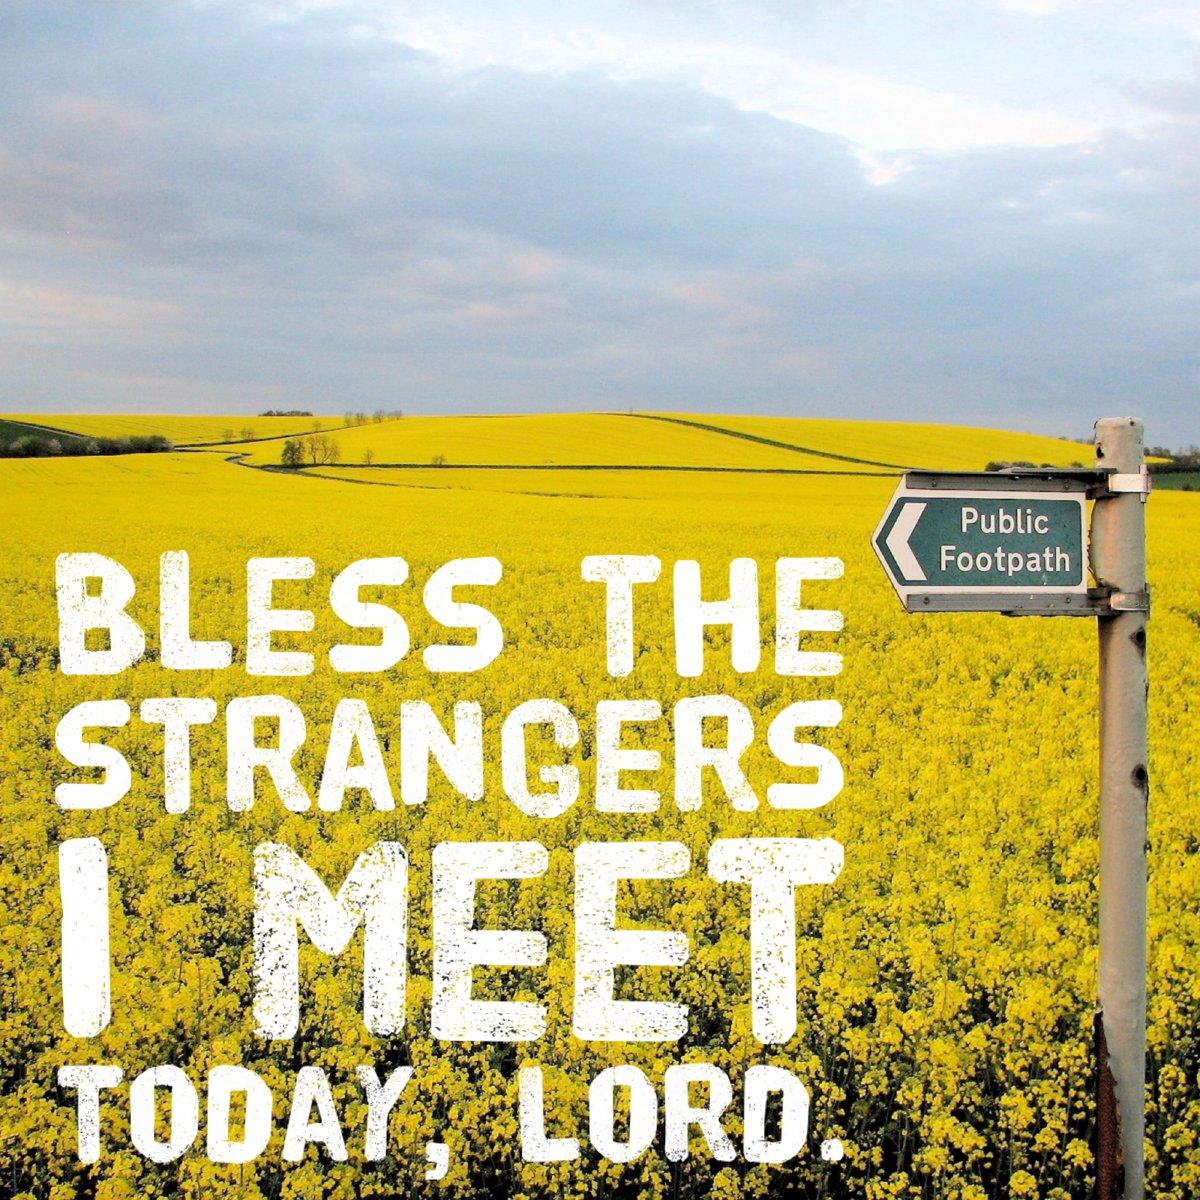 #wayside #solihull #shirley #catholicchurch #catholic #church #prayer #mass #monday #newweek #newweekblessings #prayer #blessing